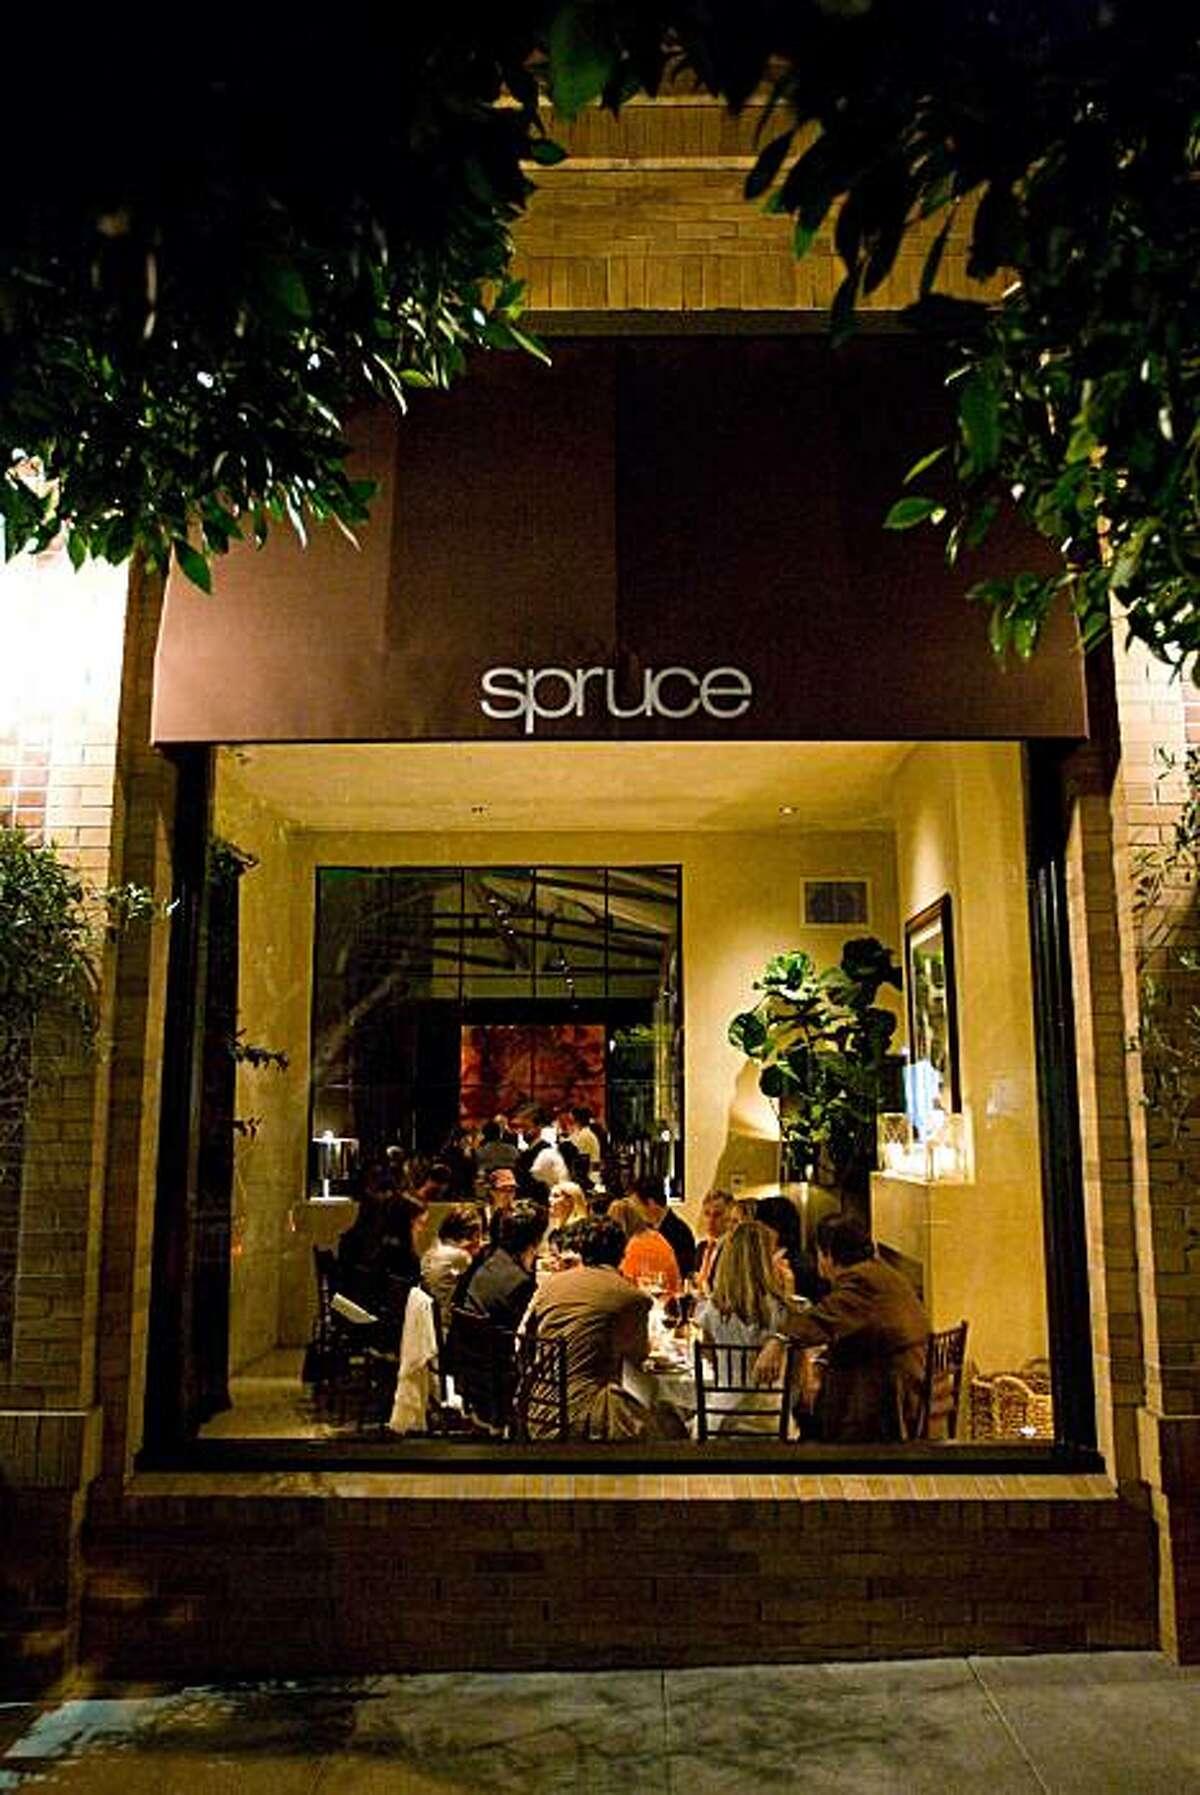 Lawren Howell and Jennifer Siebel Newsom hosted a dinner for renown designer Tommy Hilfiger at Spruce in San Francisco.